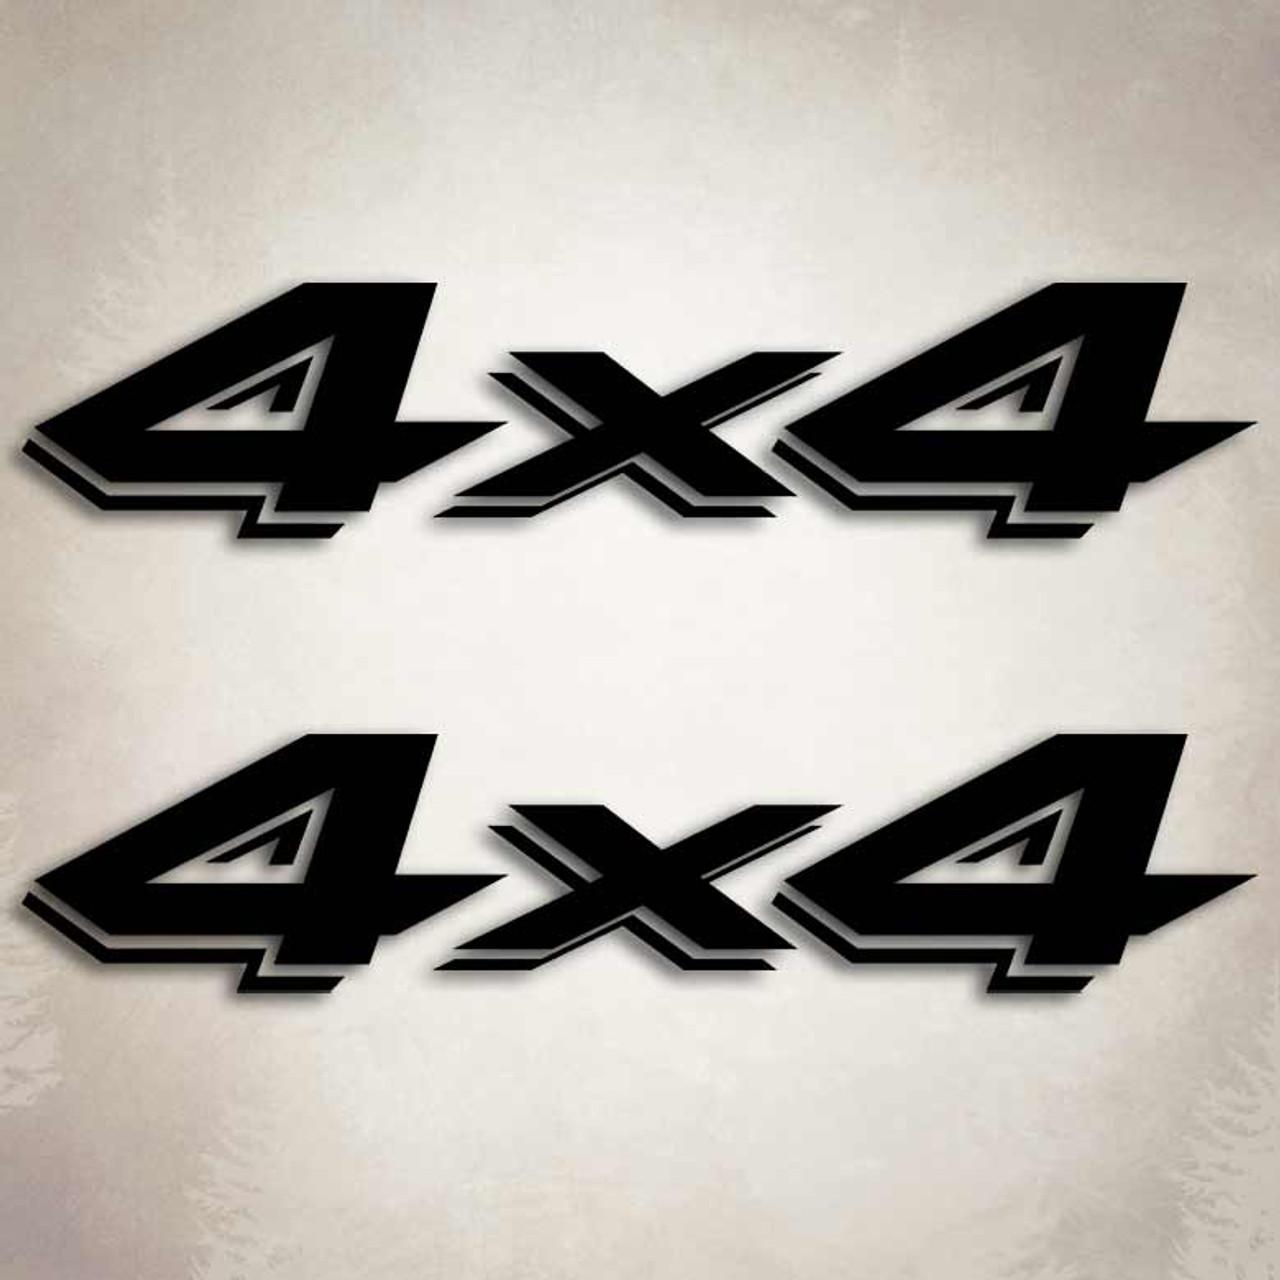 4x4 dodge dakota truck decal set